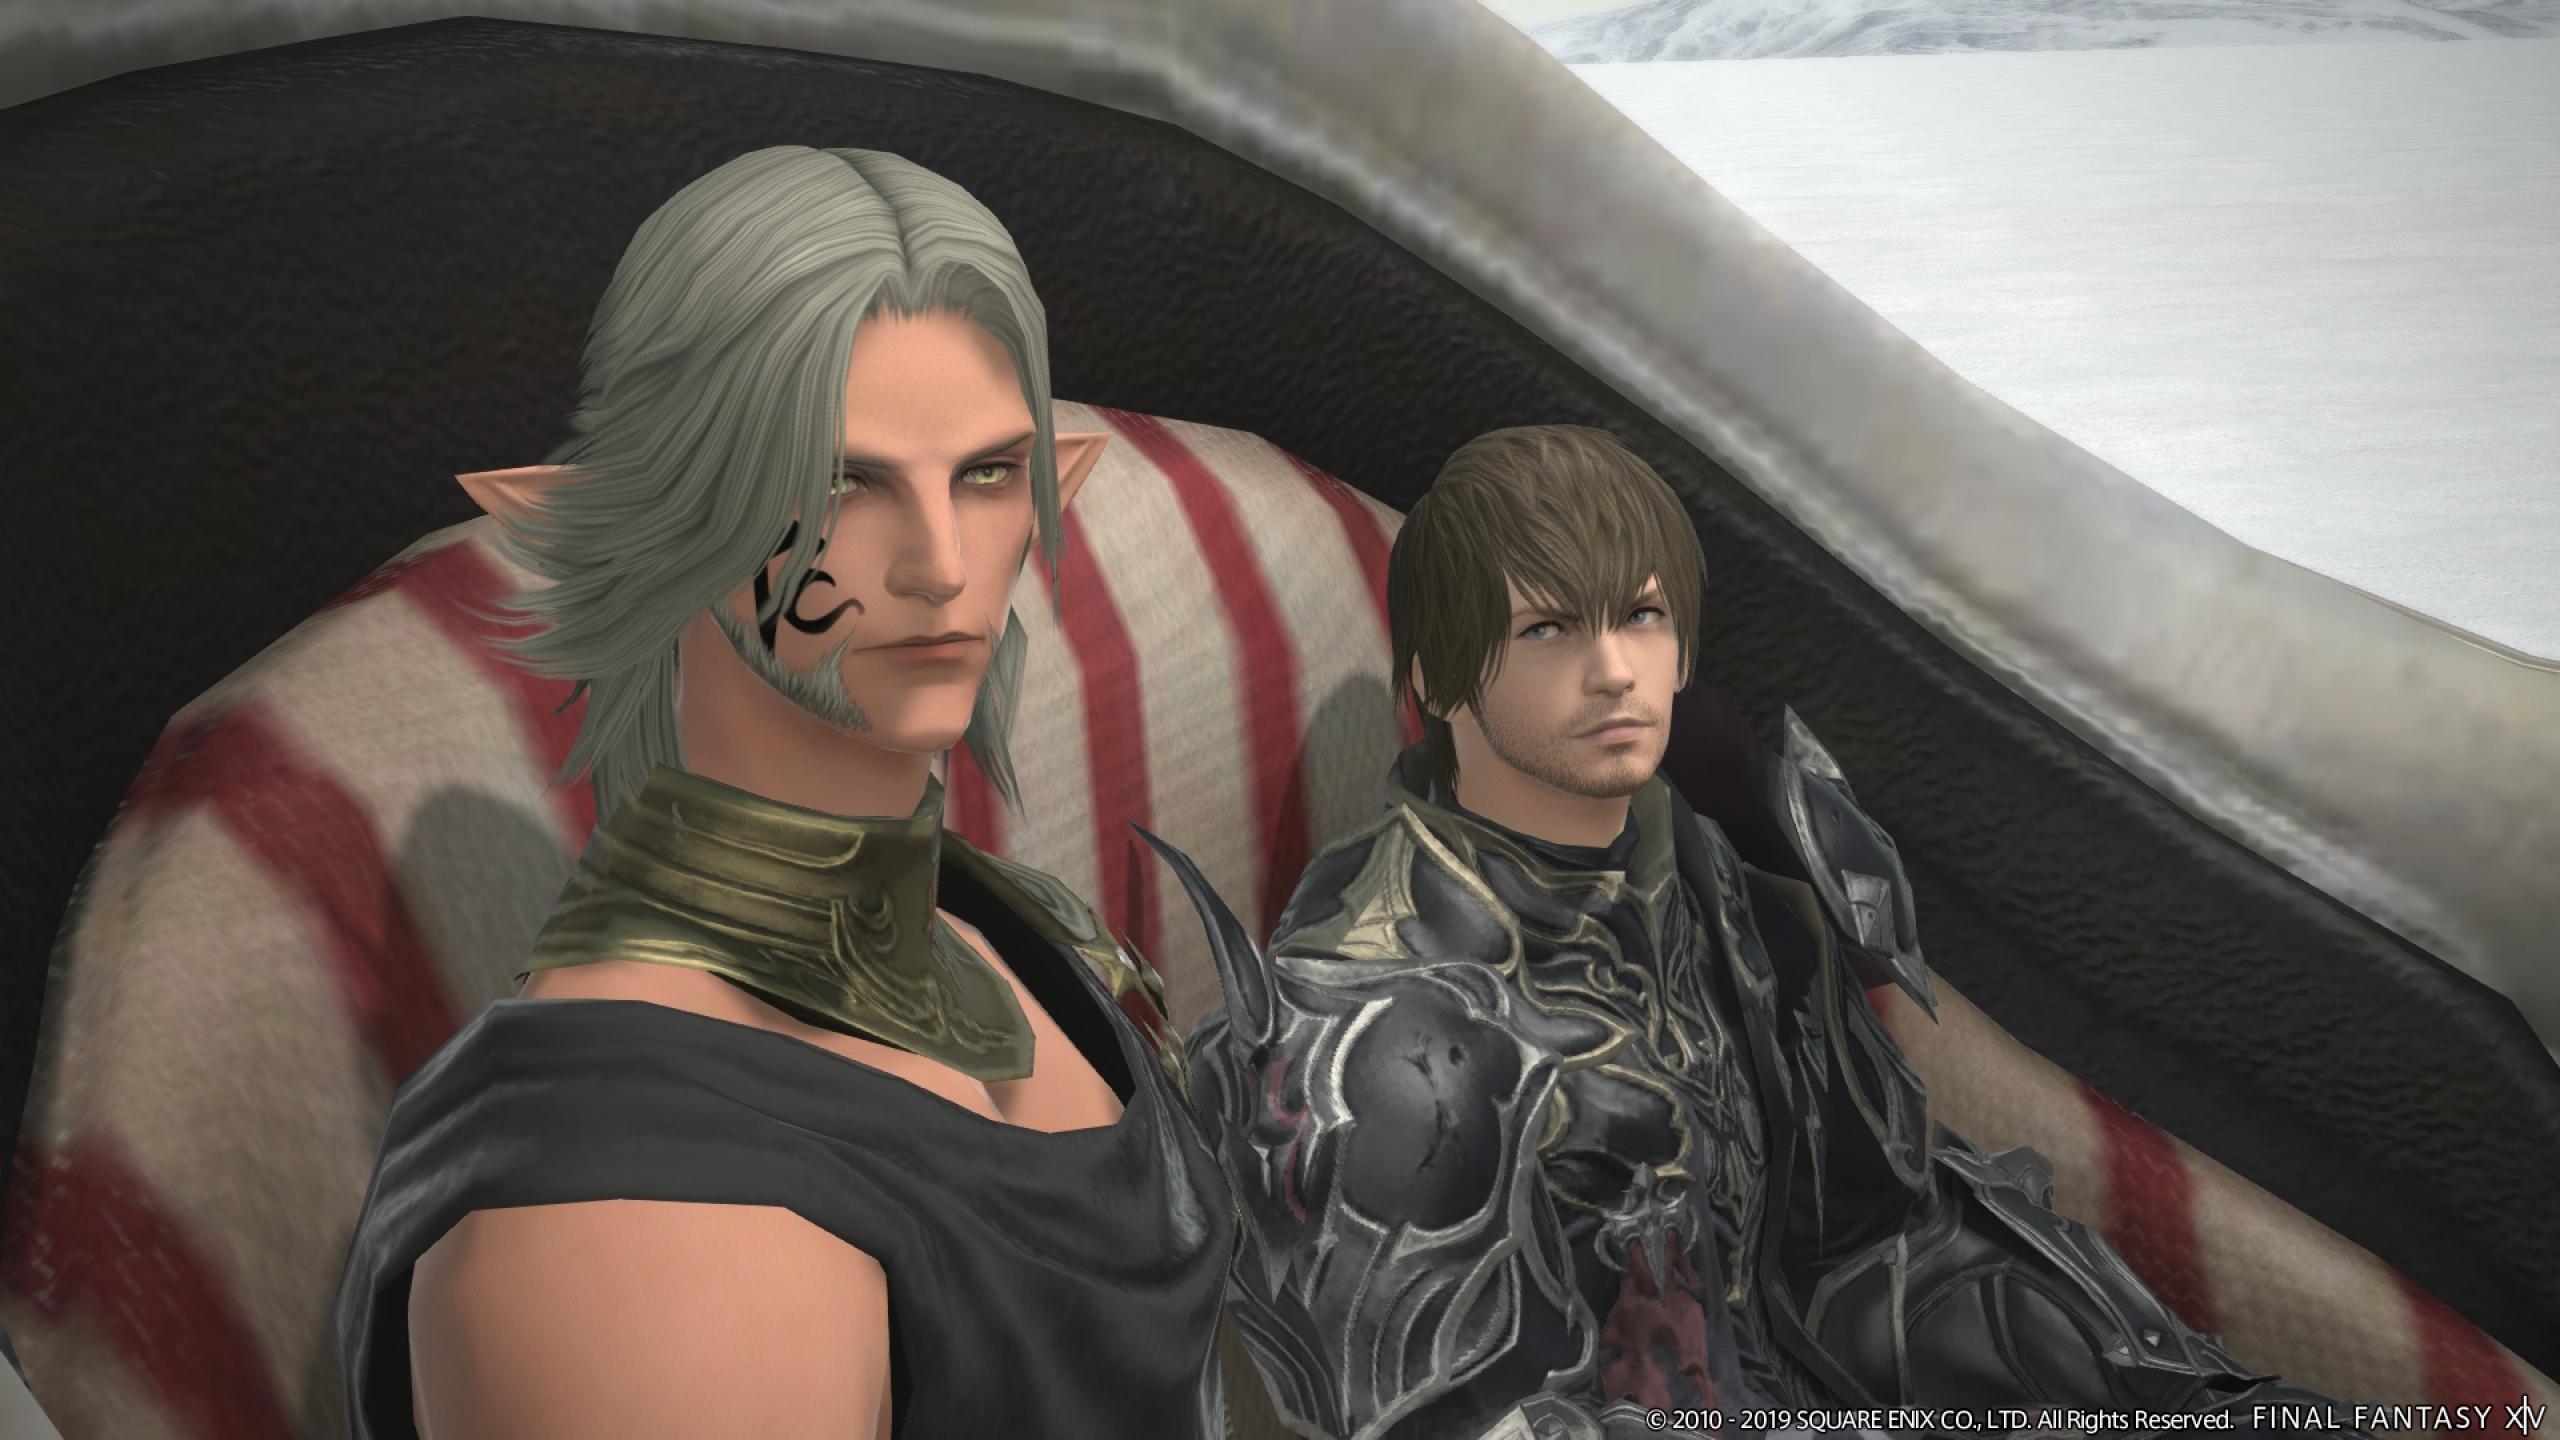 2560x1440 Final Fantasy Xiv Shadowbringers 1440p Resolution